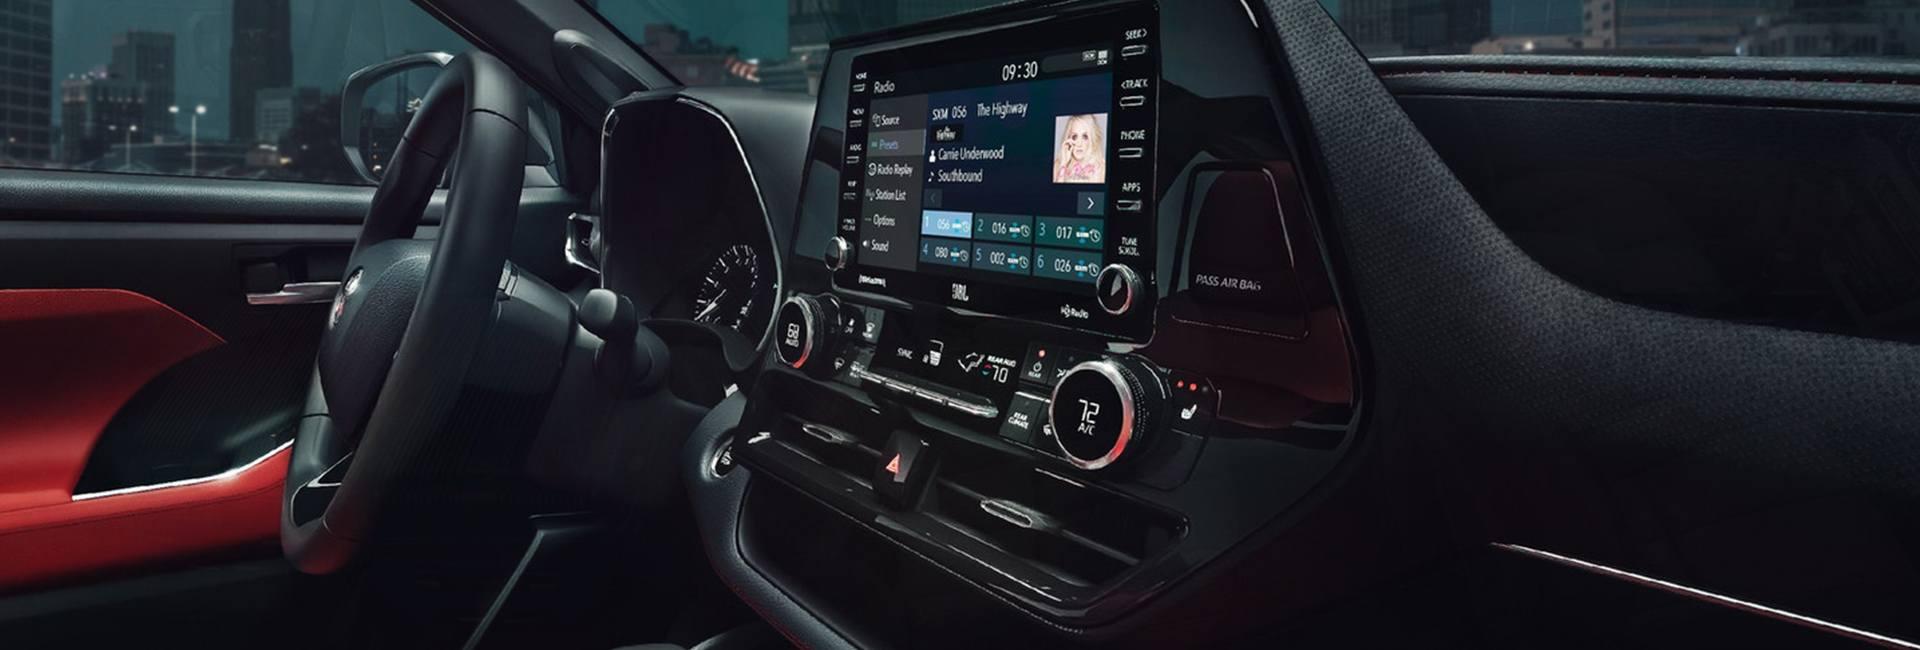 Interior image of the 2021 Toyota Highlander